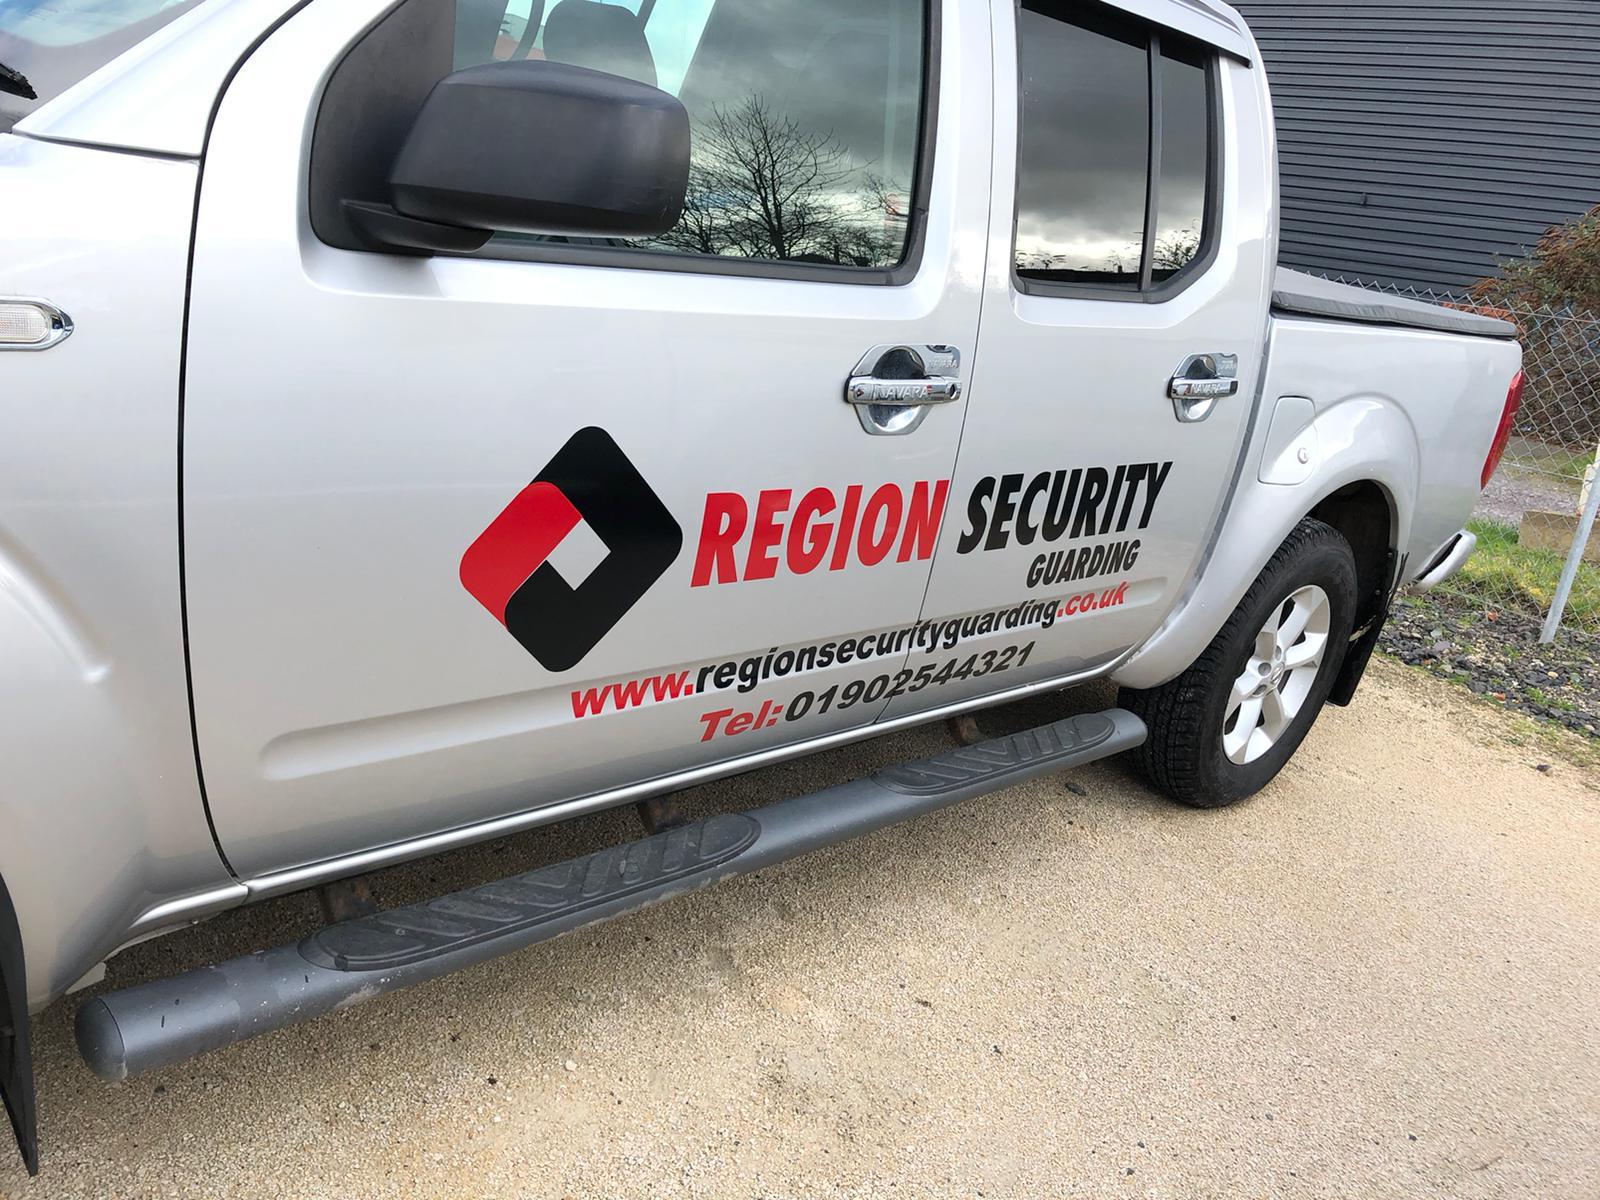 Security Company Cardiff